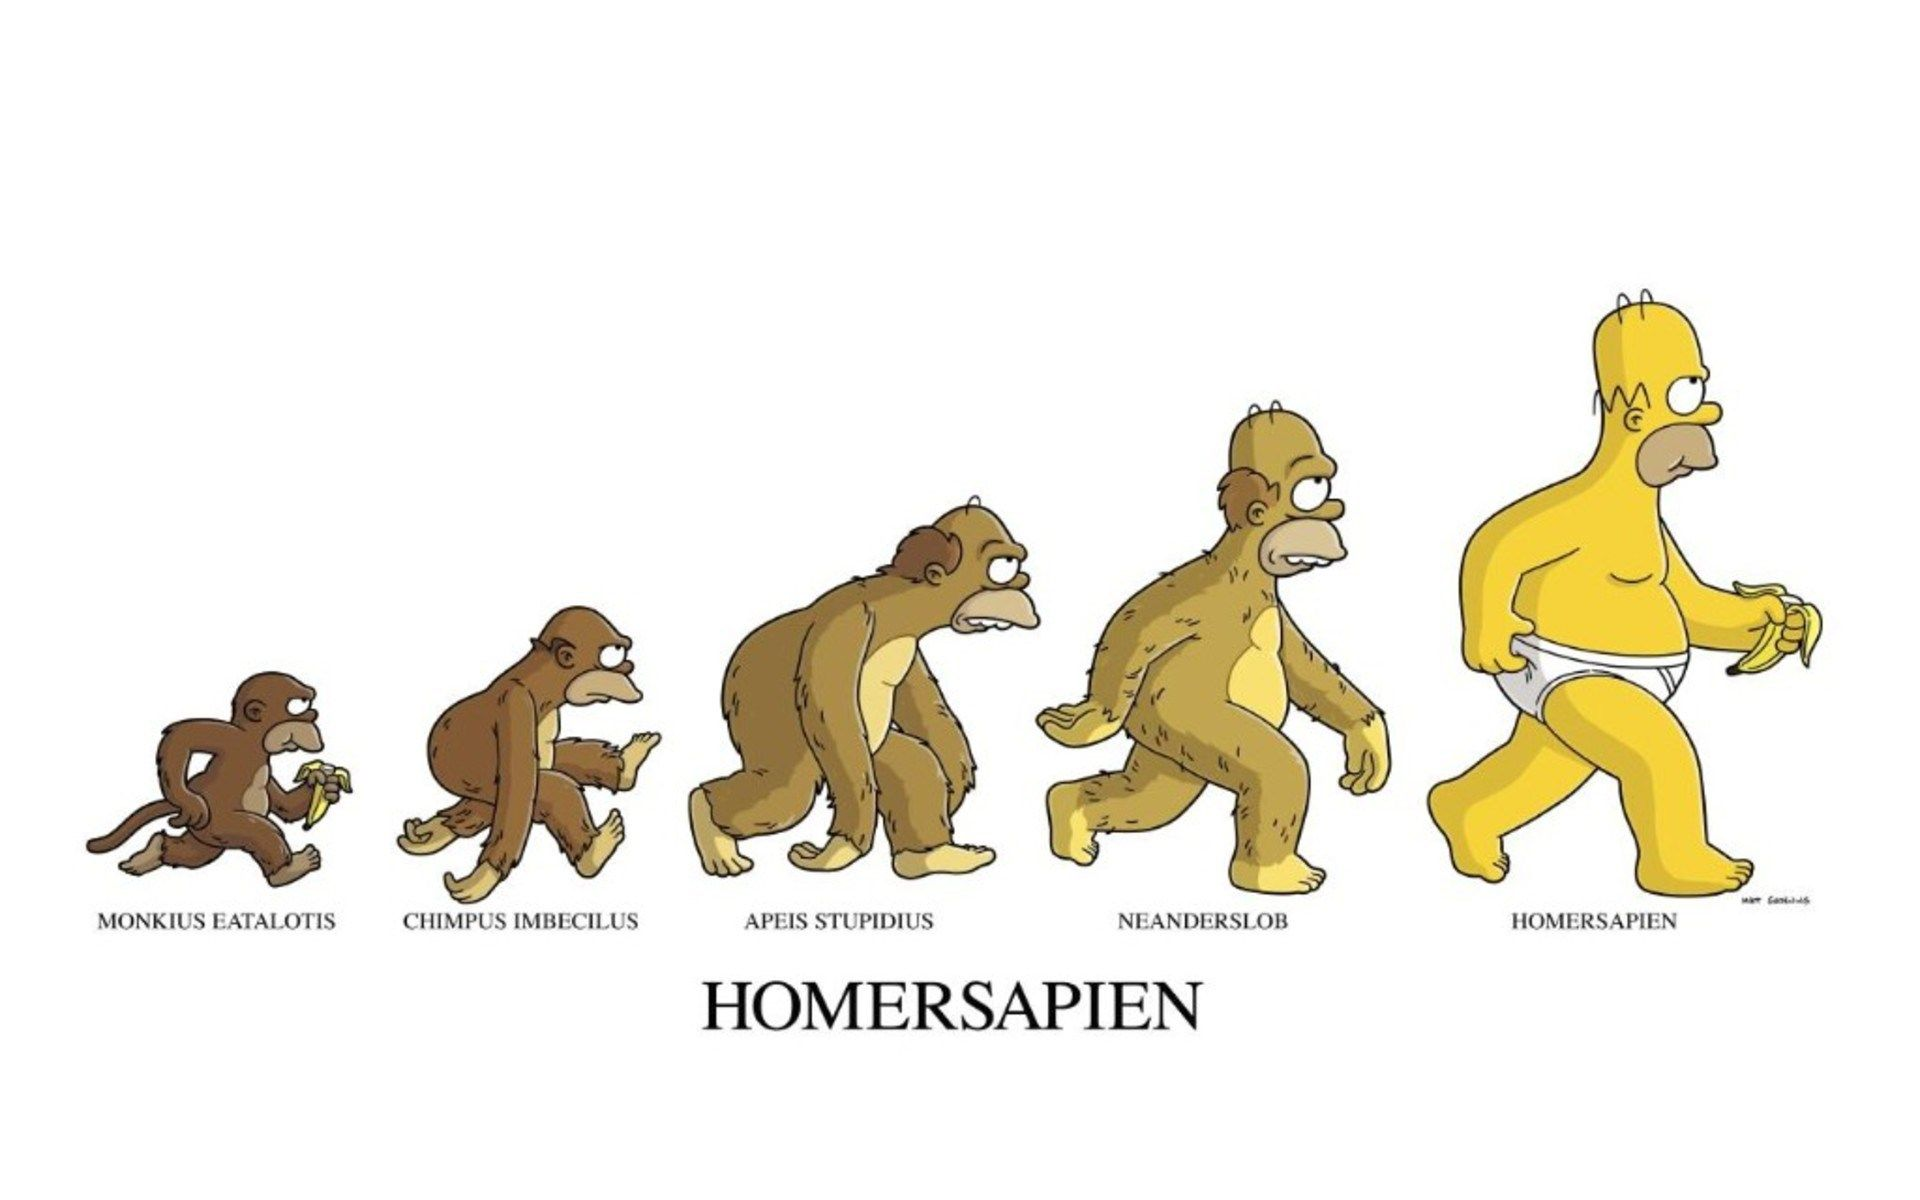 The simpsons desktop x hueputalo pinterest hilarious